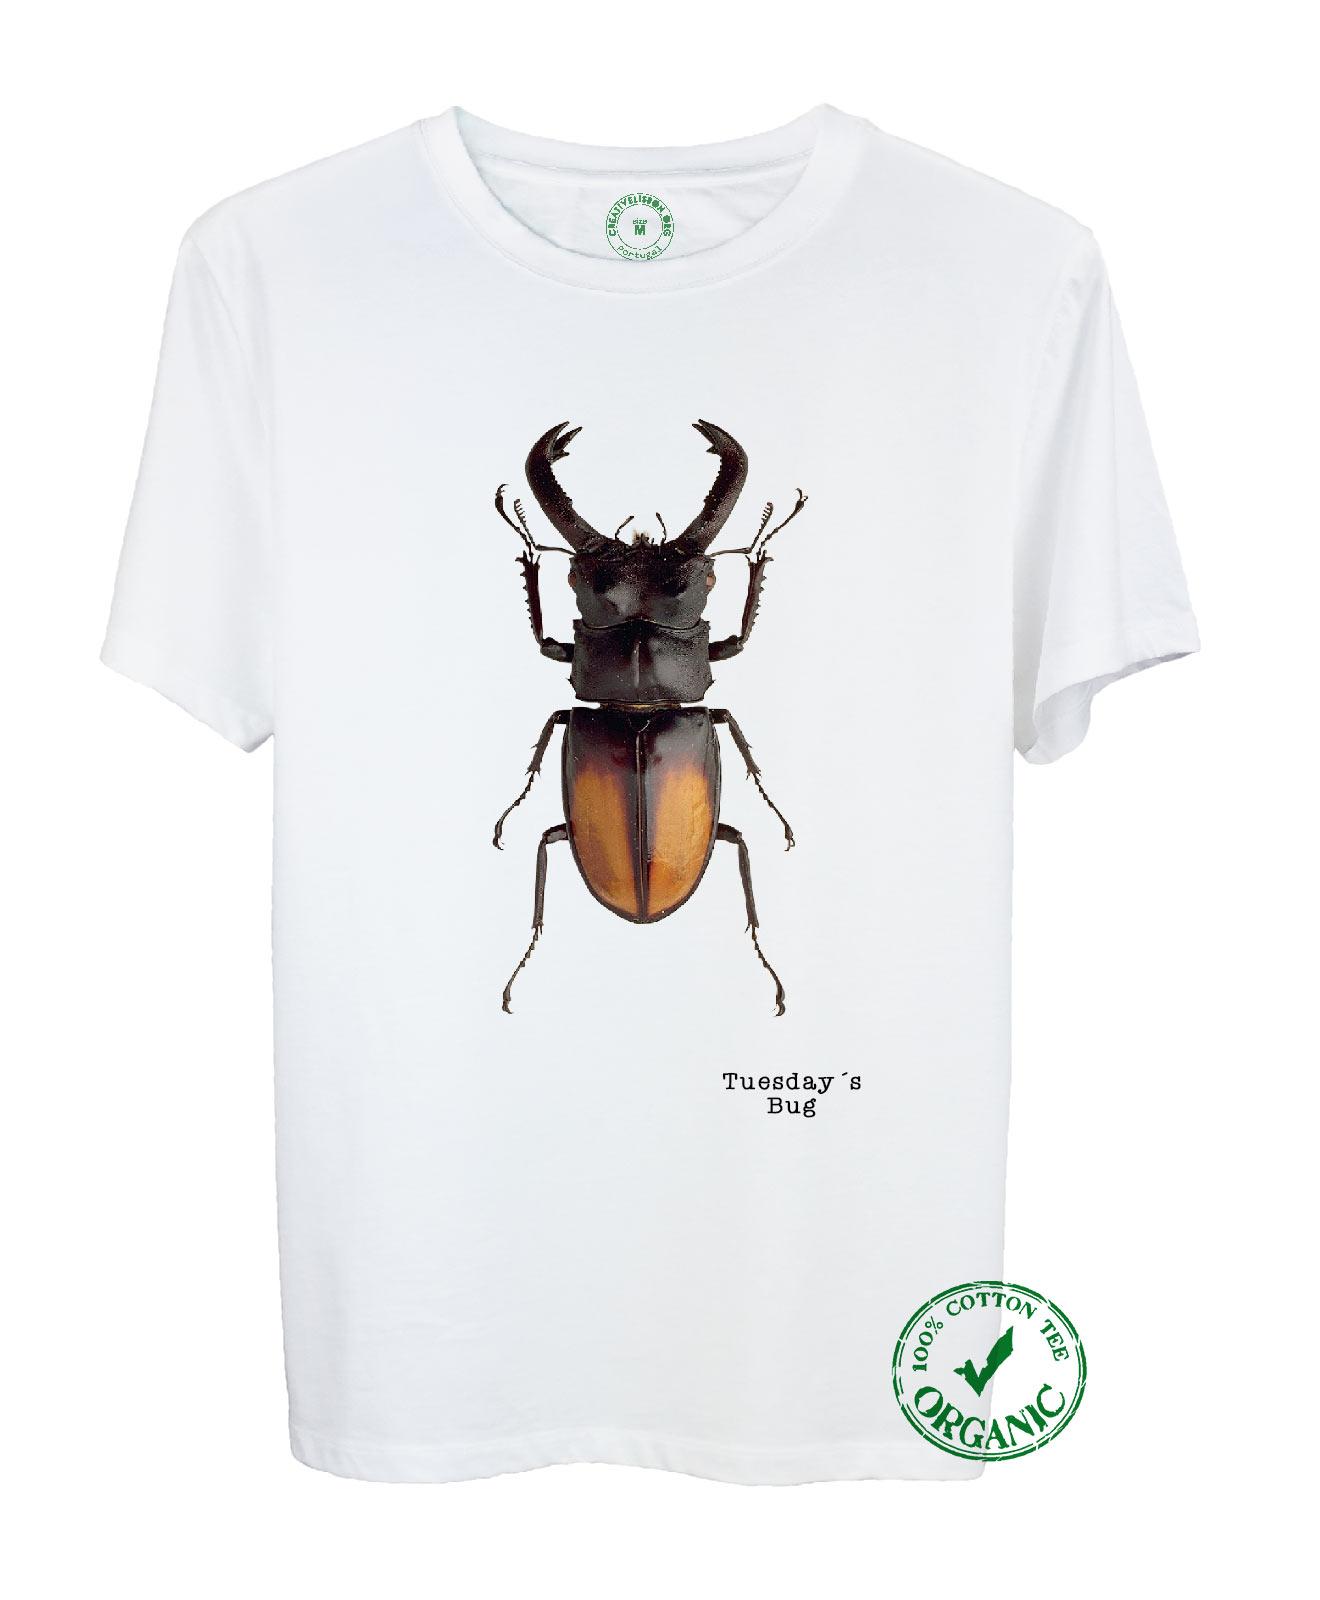 Tuesday Bug Organic T-shirt